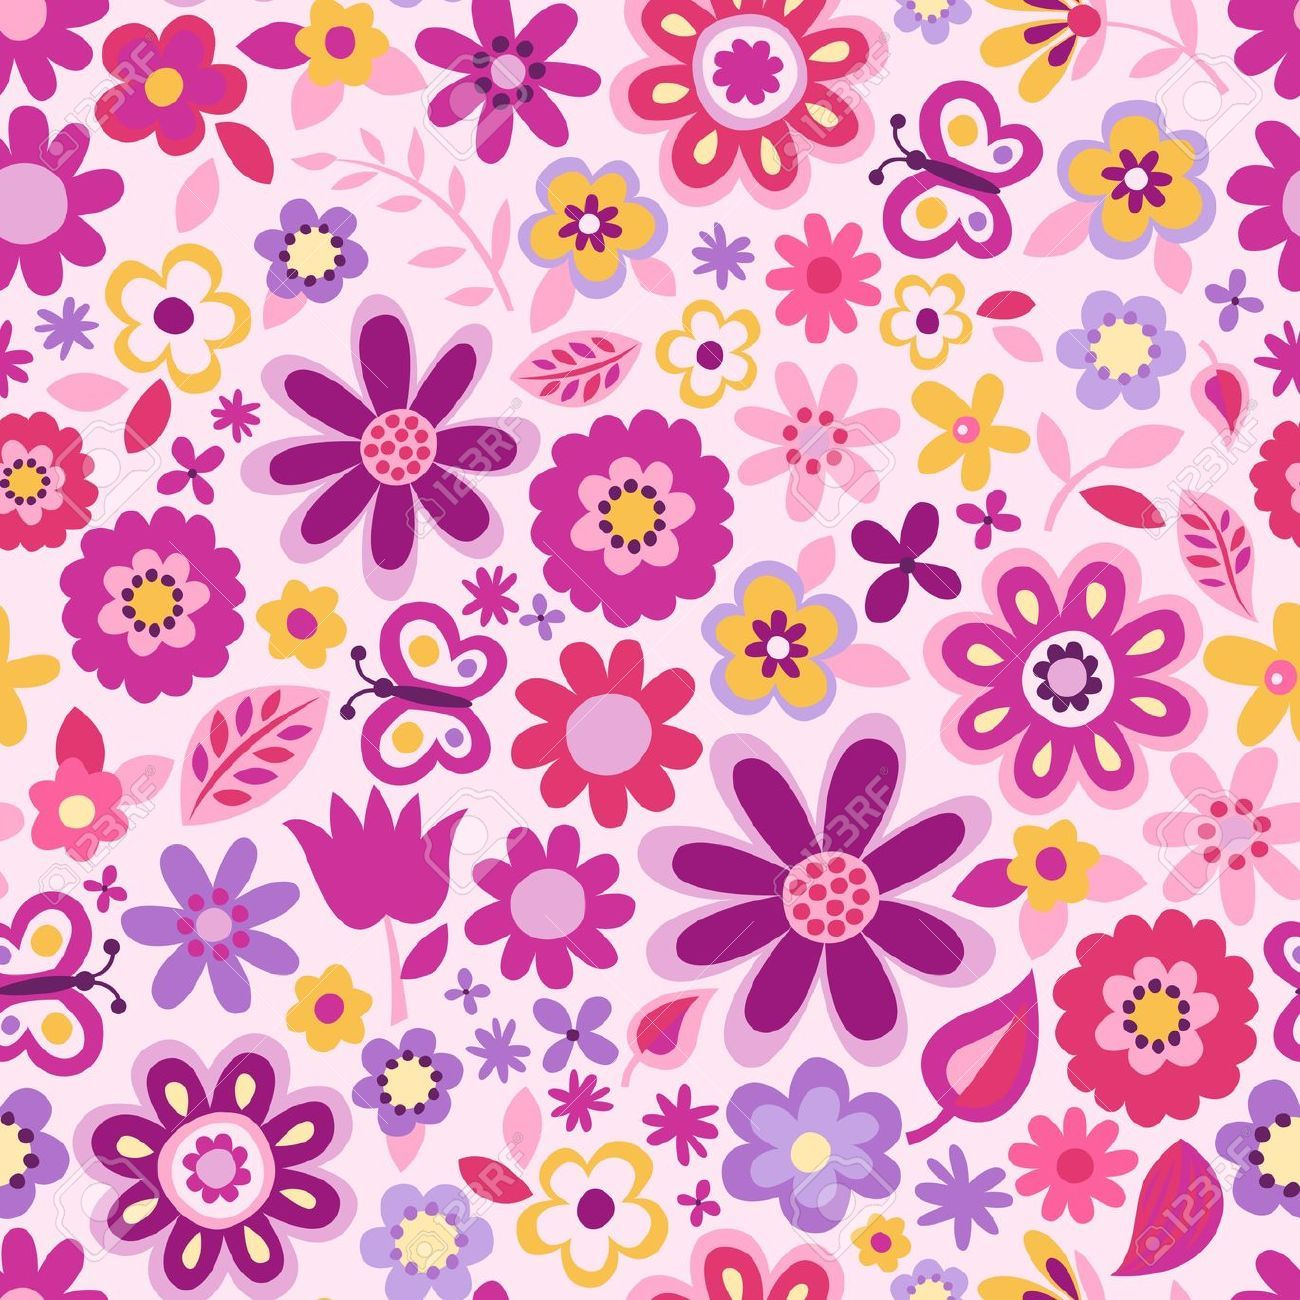 undefined Cute Pattern Wallpaper (35 Wallpapers ...